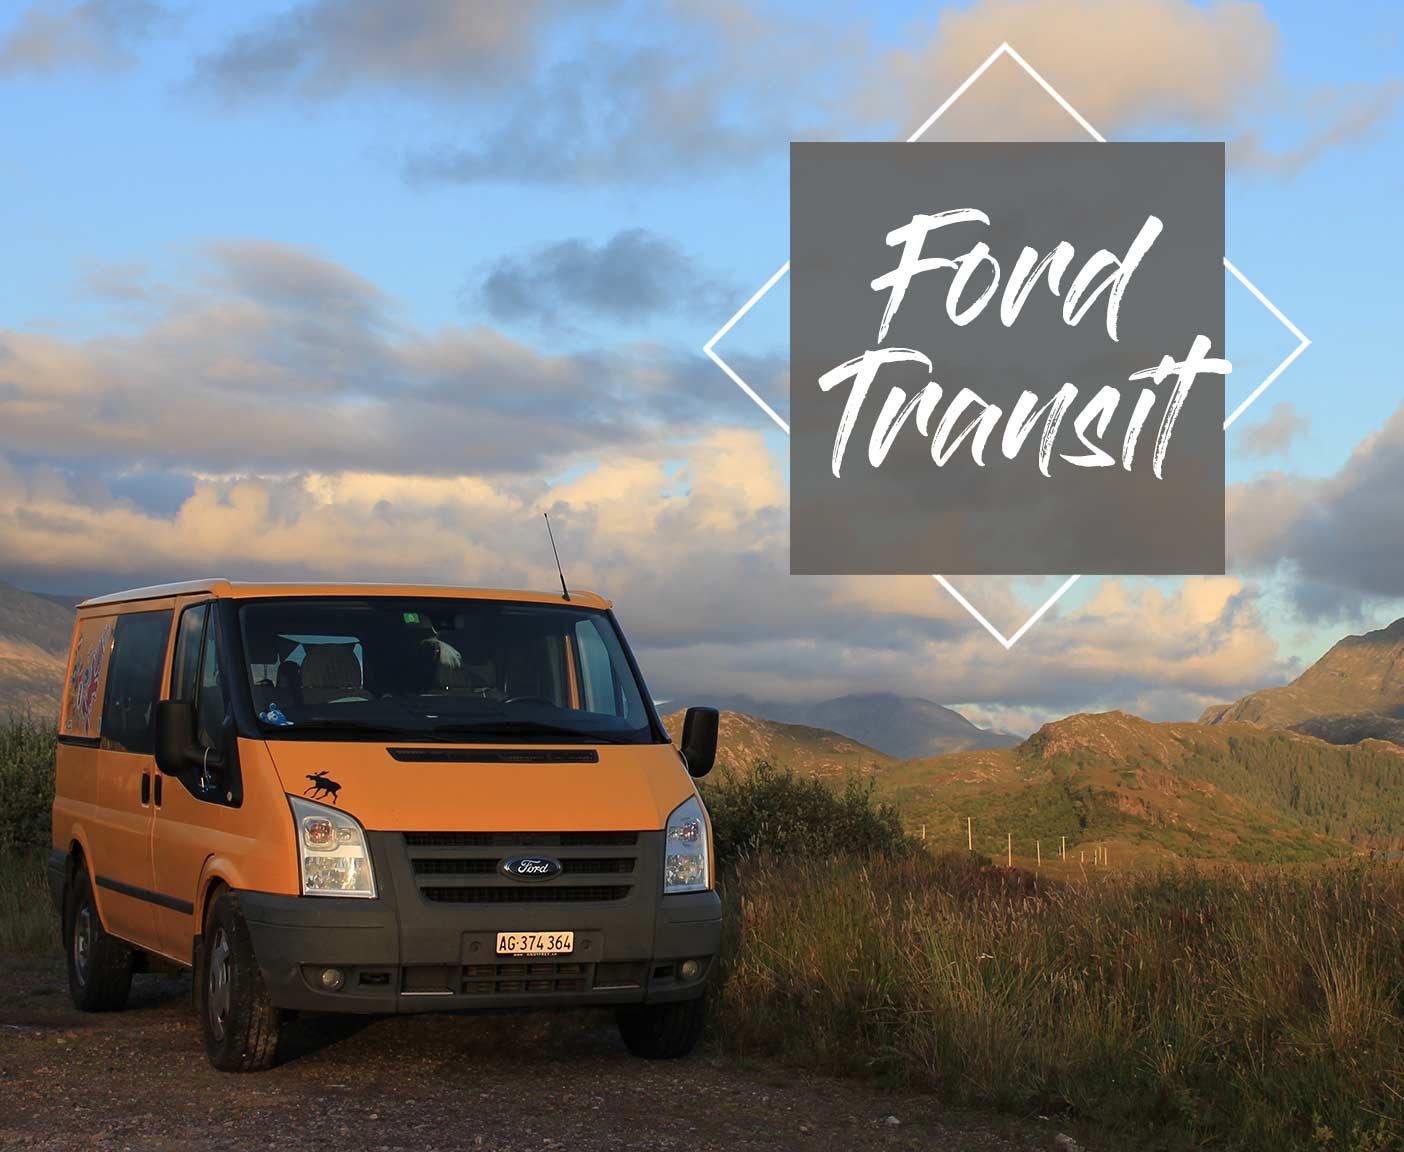 Ford-transit-kastenwagen-van-camper-vanlife-custom